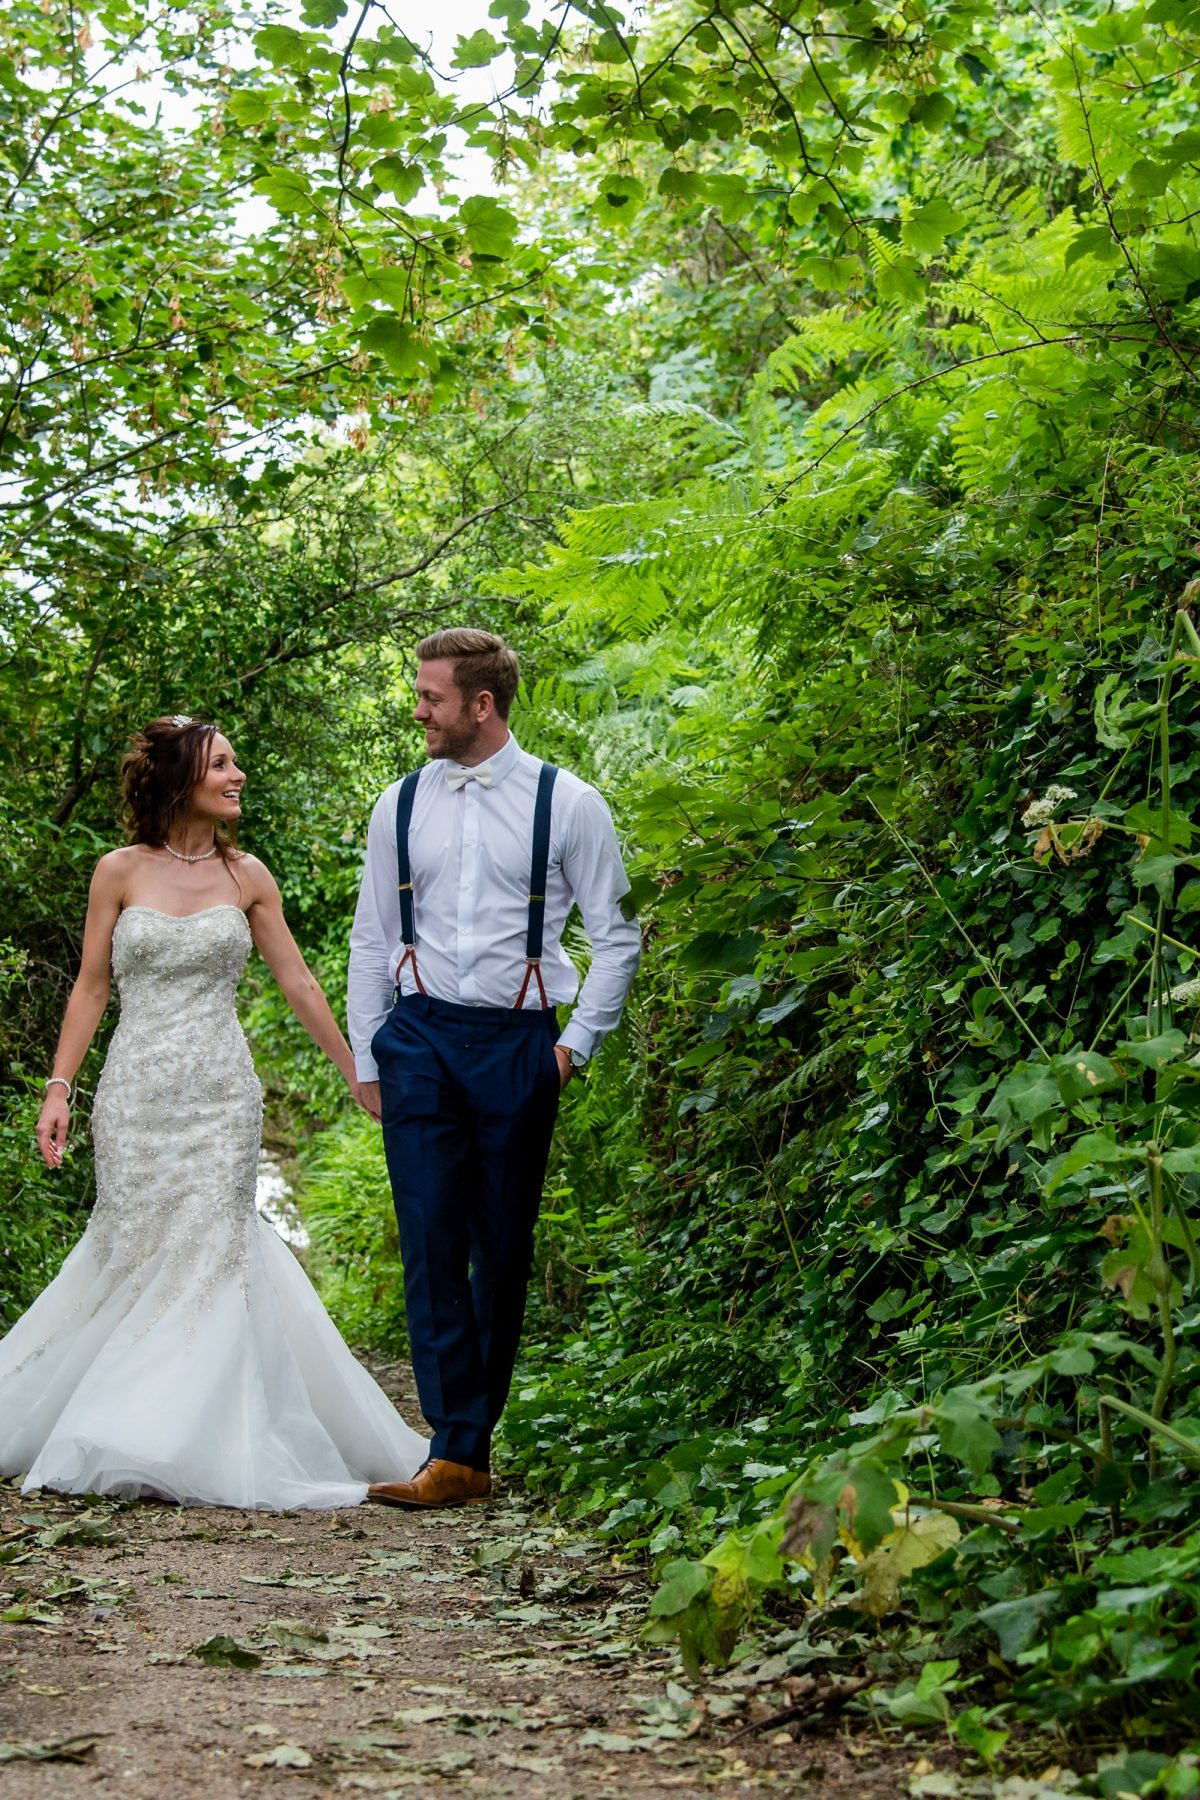 Bride and groom walking in woodland.